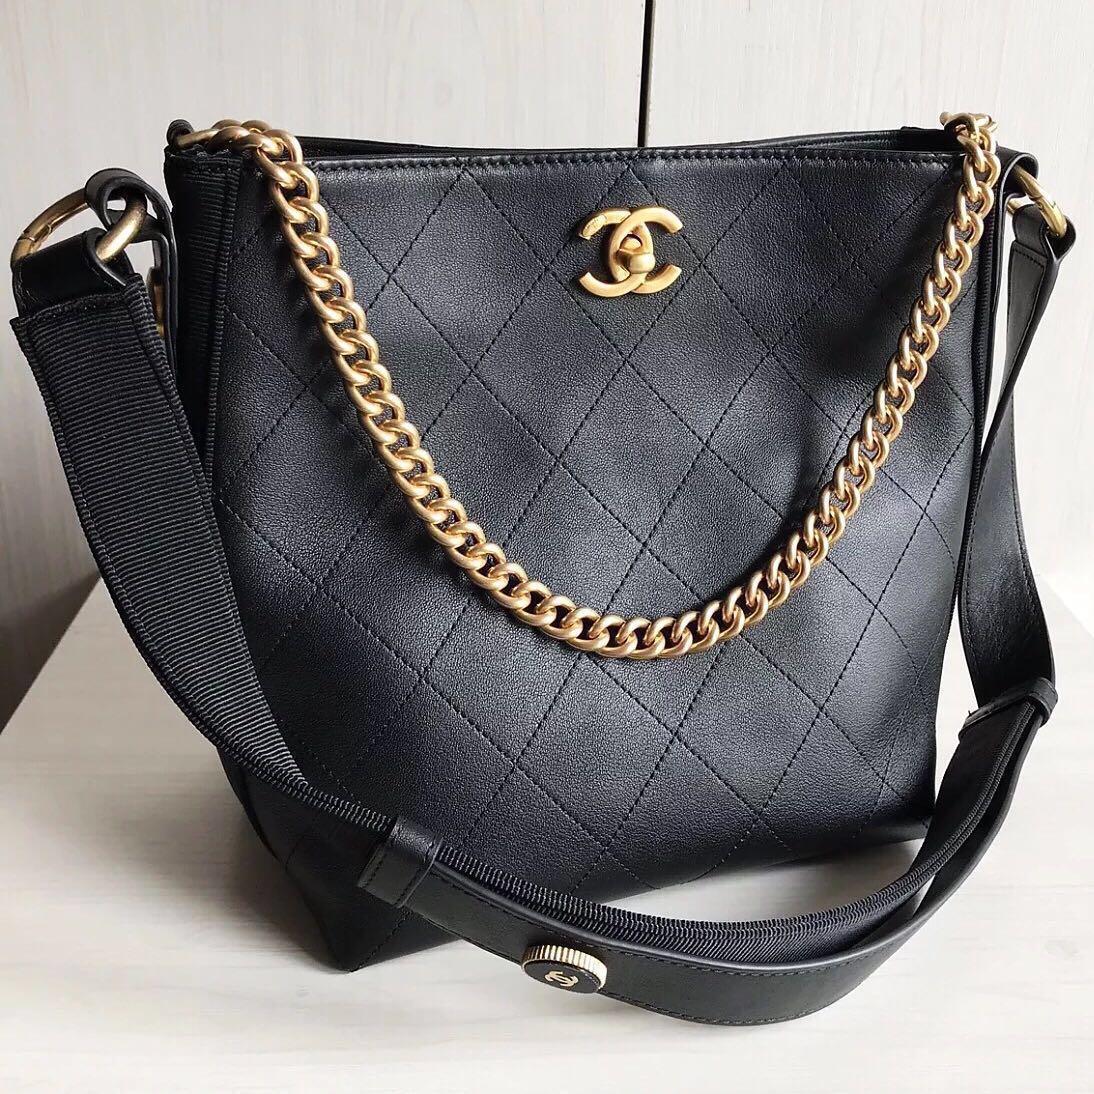 4a16d2d04f95 Chanel Hobo Handbag 2018 - Handbag Photos Eleventyone.Org